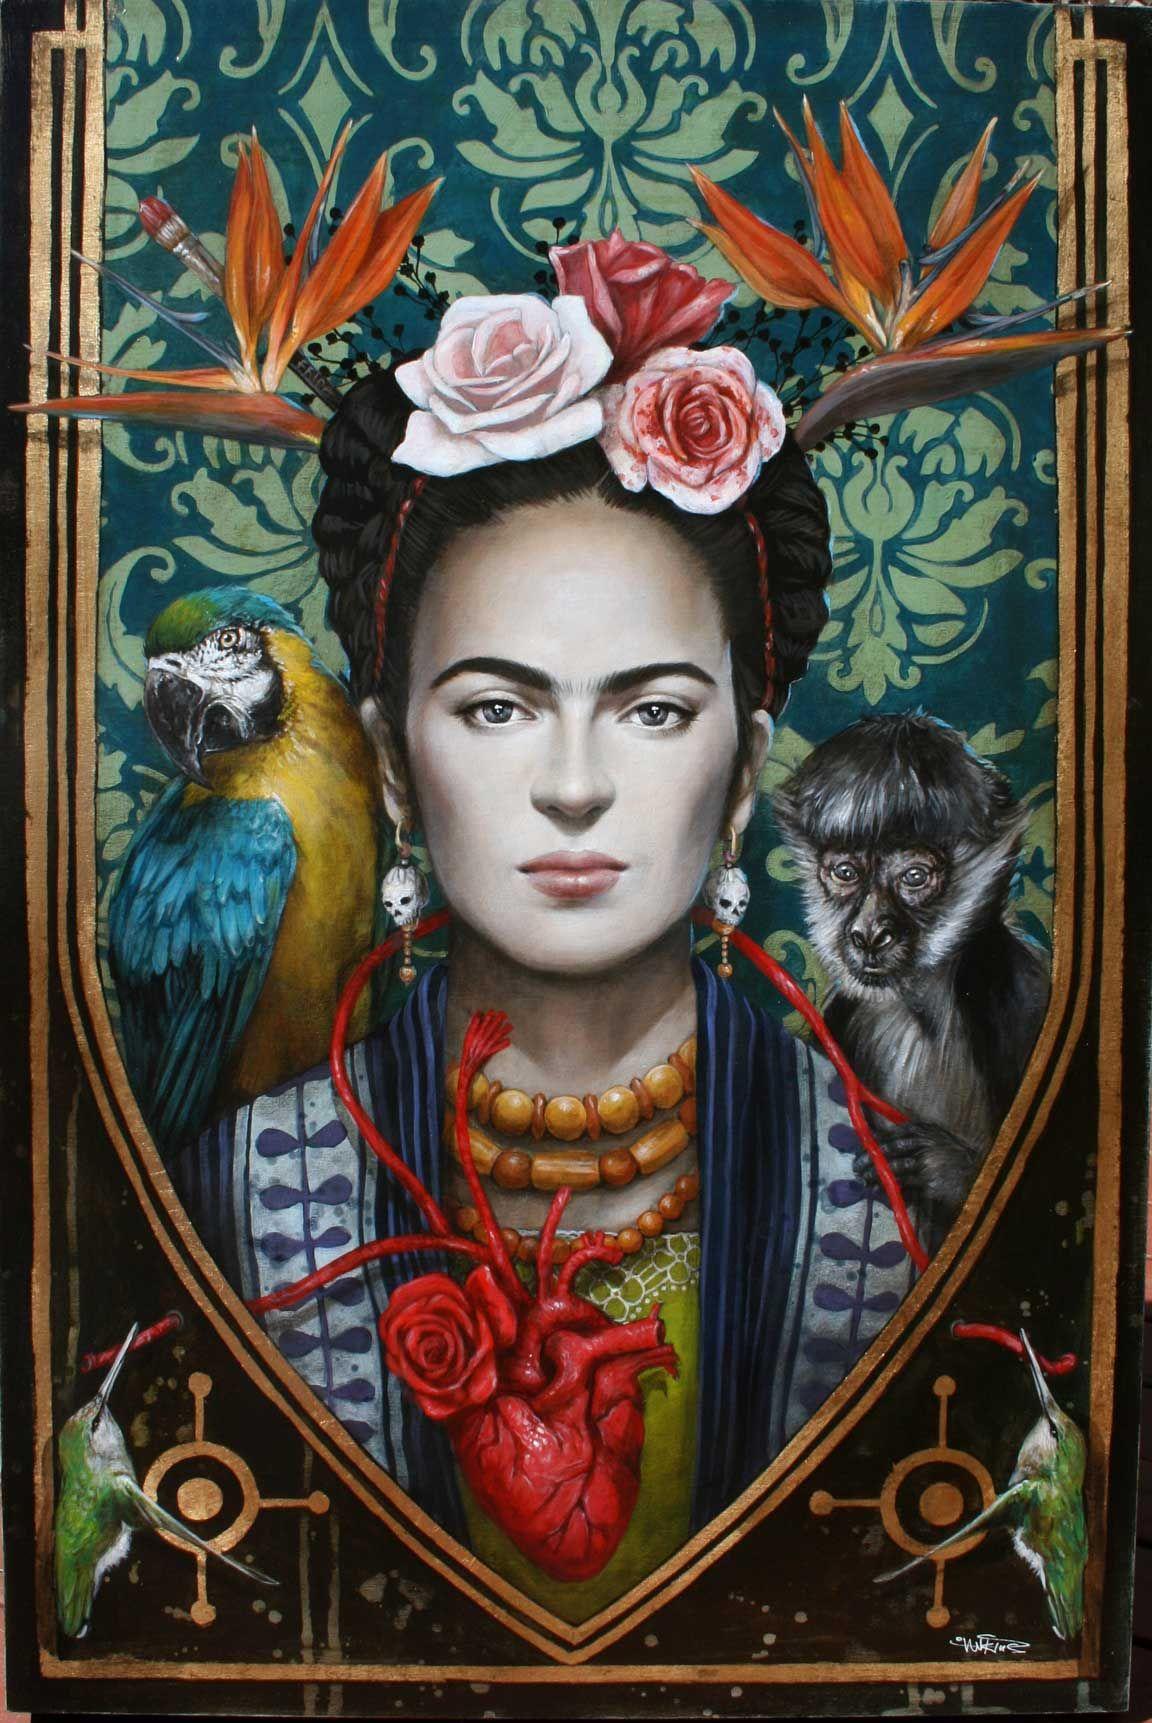 """Frida"" by Sophie Wilkins. | Frida kahlo peinture, Les arts, Art mexicain"